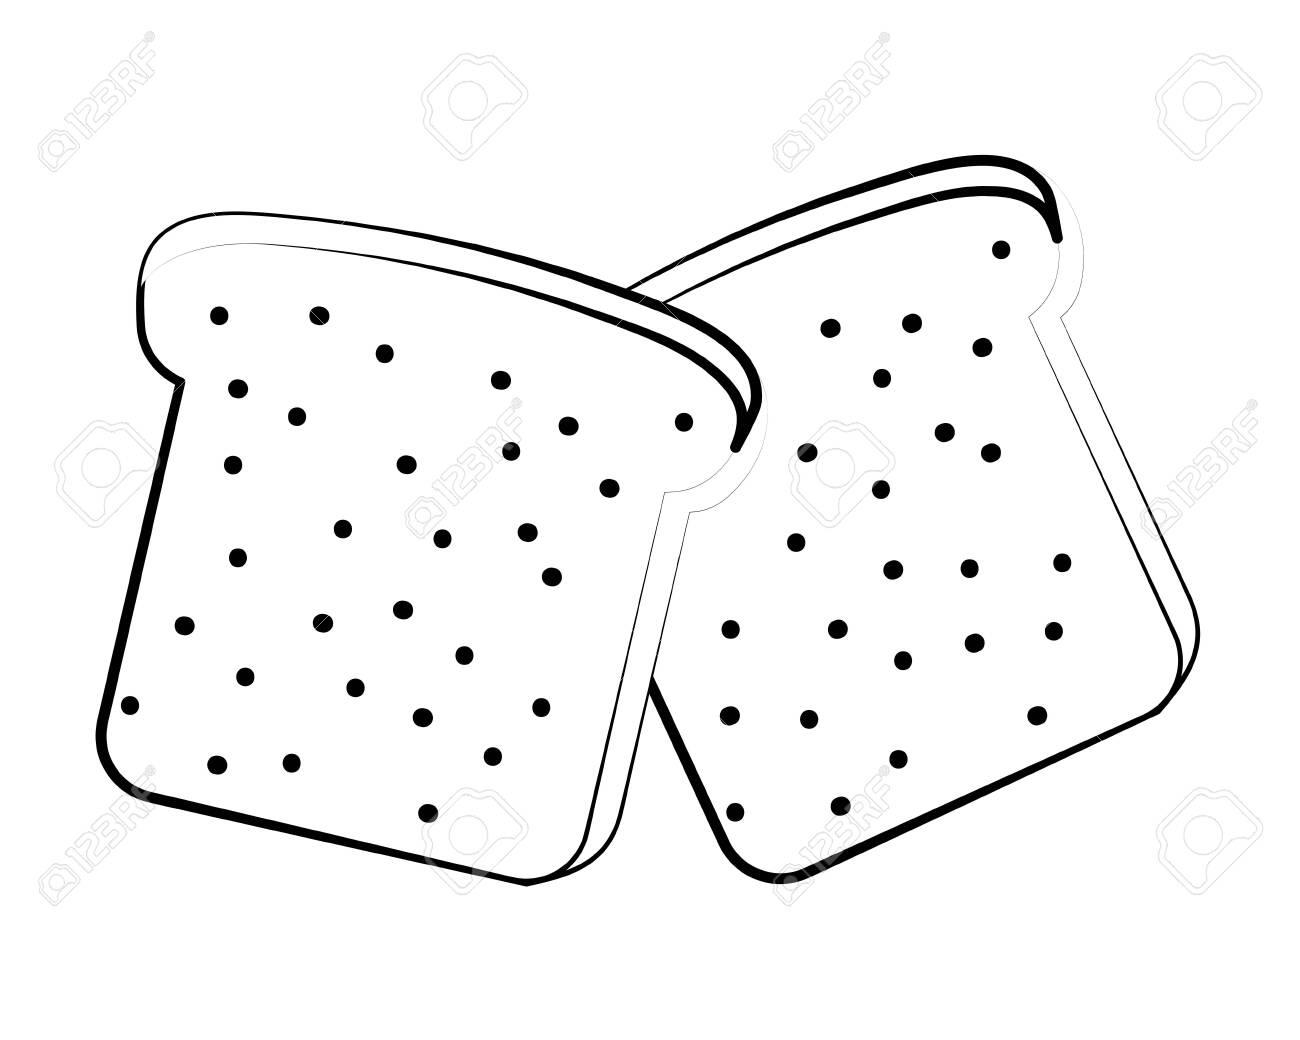 delicious tasty food toast bread cartoon vector illustration graphic design - 122940910